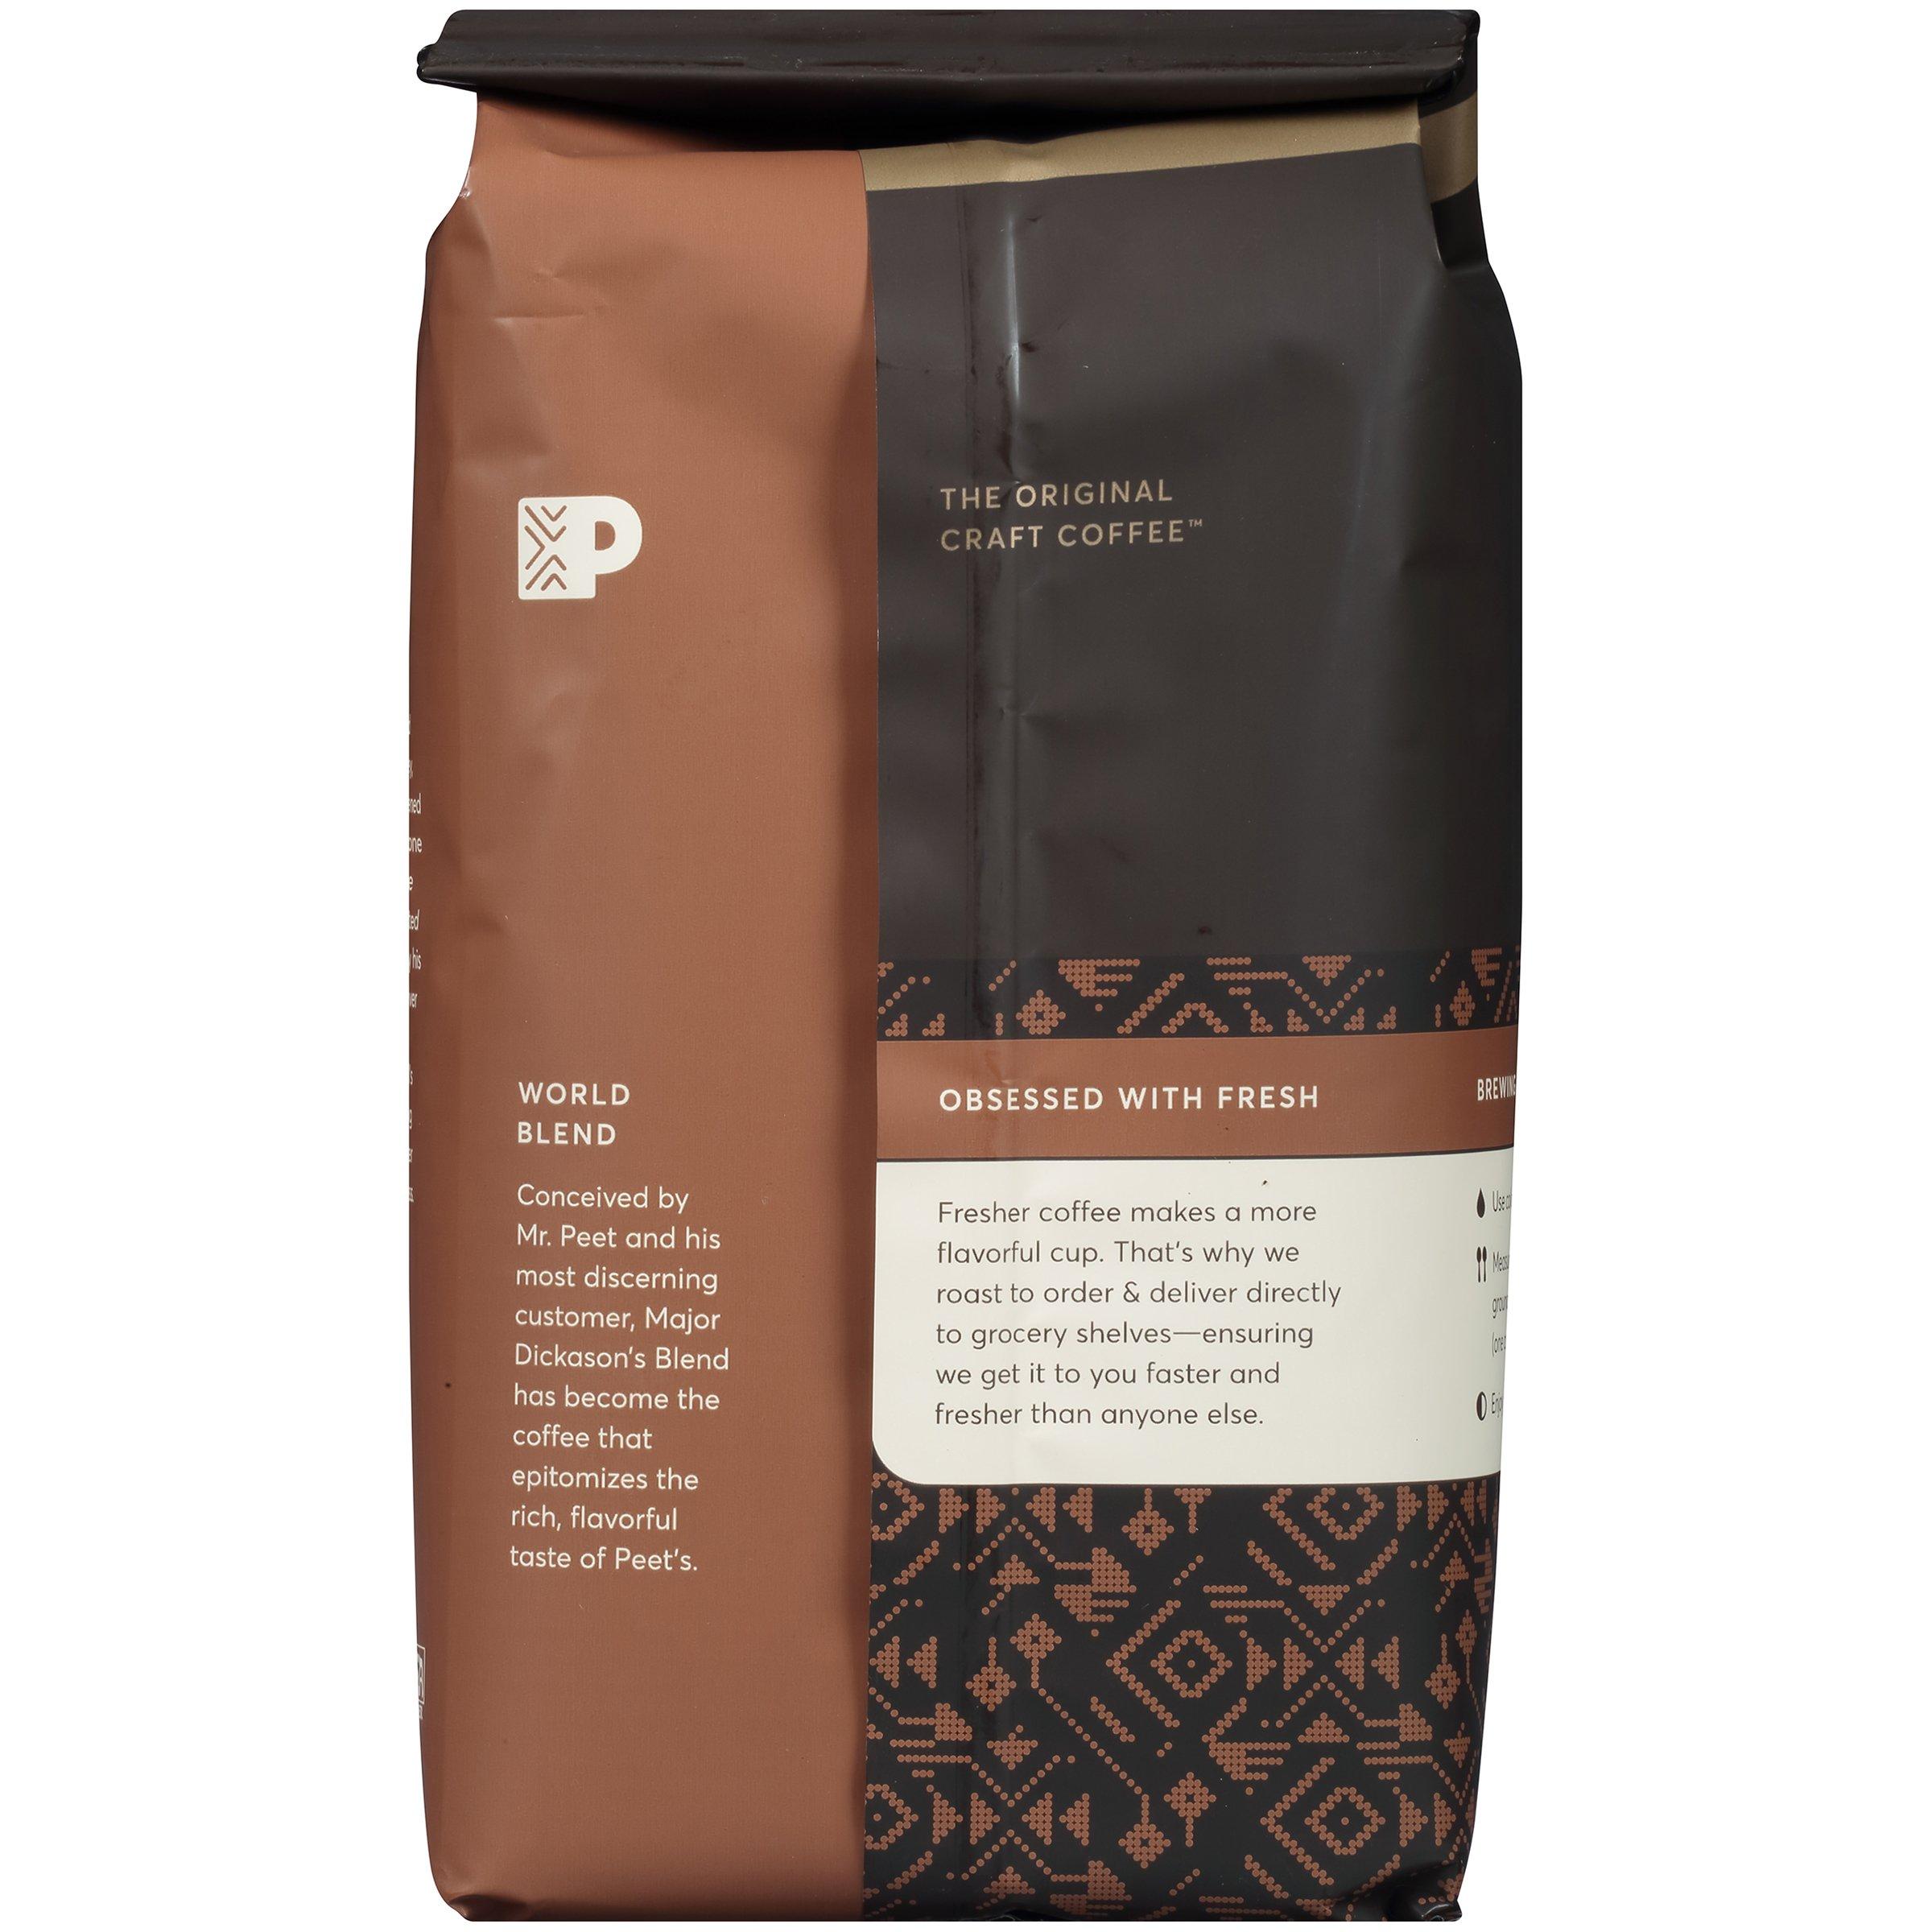 Peet's Coffee, Peetnik Pack, Major Dickason's Blend, Dark Roast, Ground Coffee, 20 oz. Bag, Rich, Smooth, and Complex Dark Roast Coffee Blend With A Full Bodied and Layered Flavor by Peet's Coffee (Image #2)